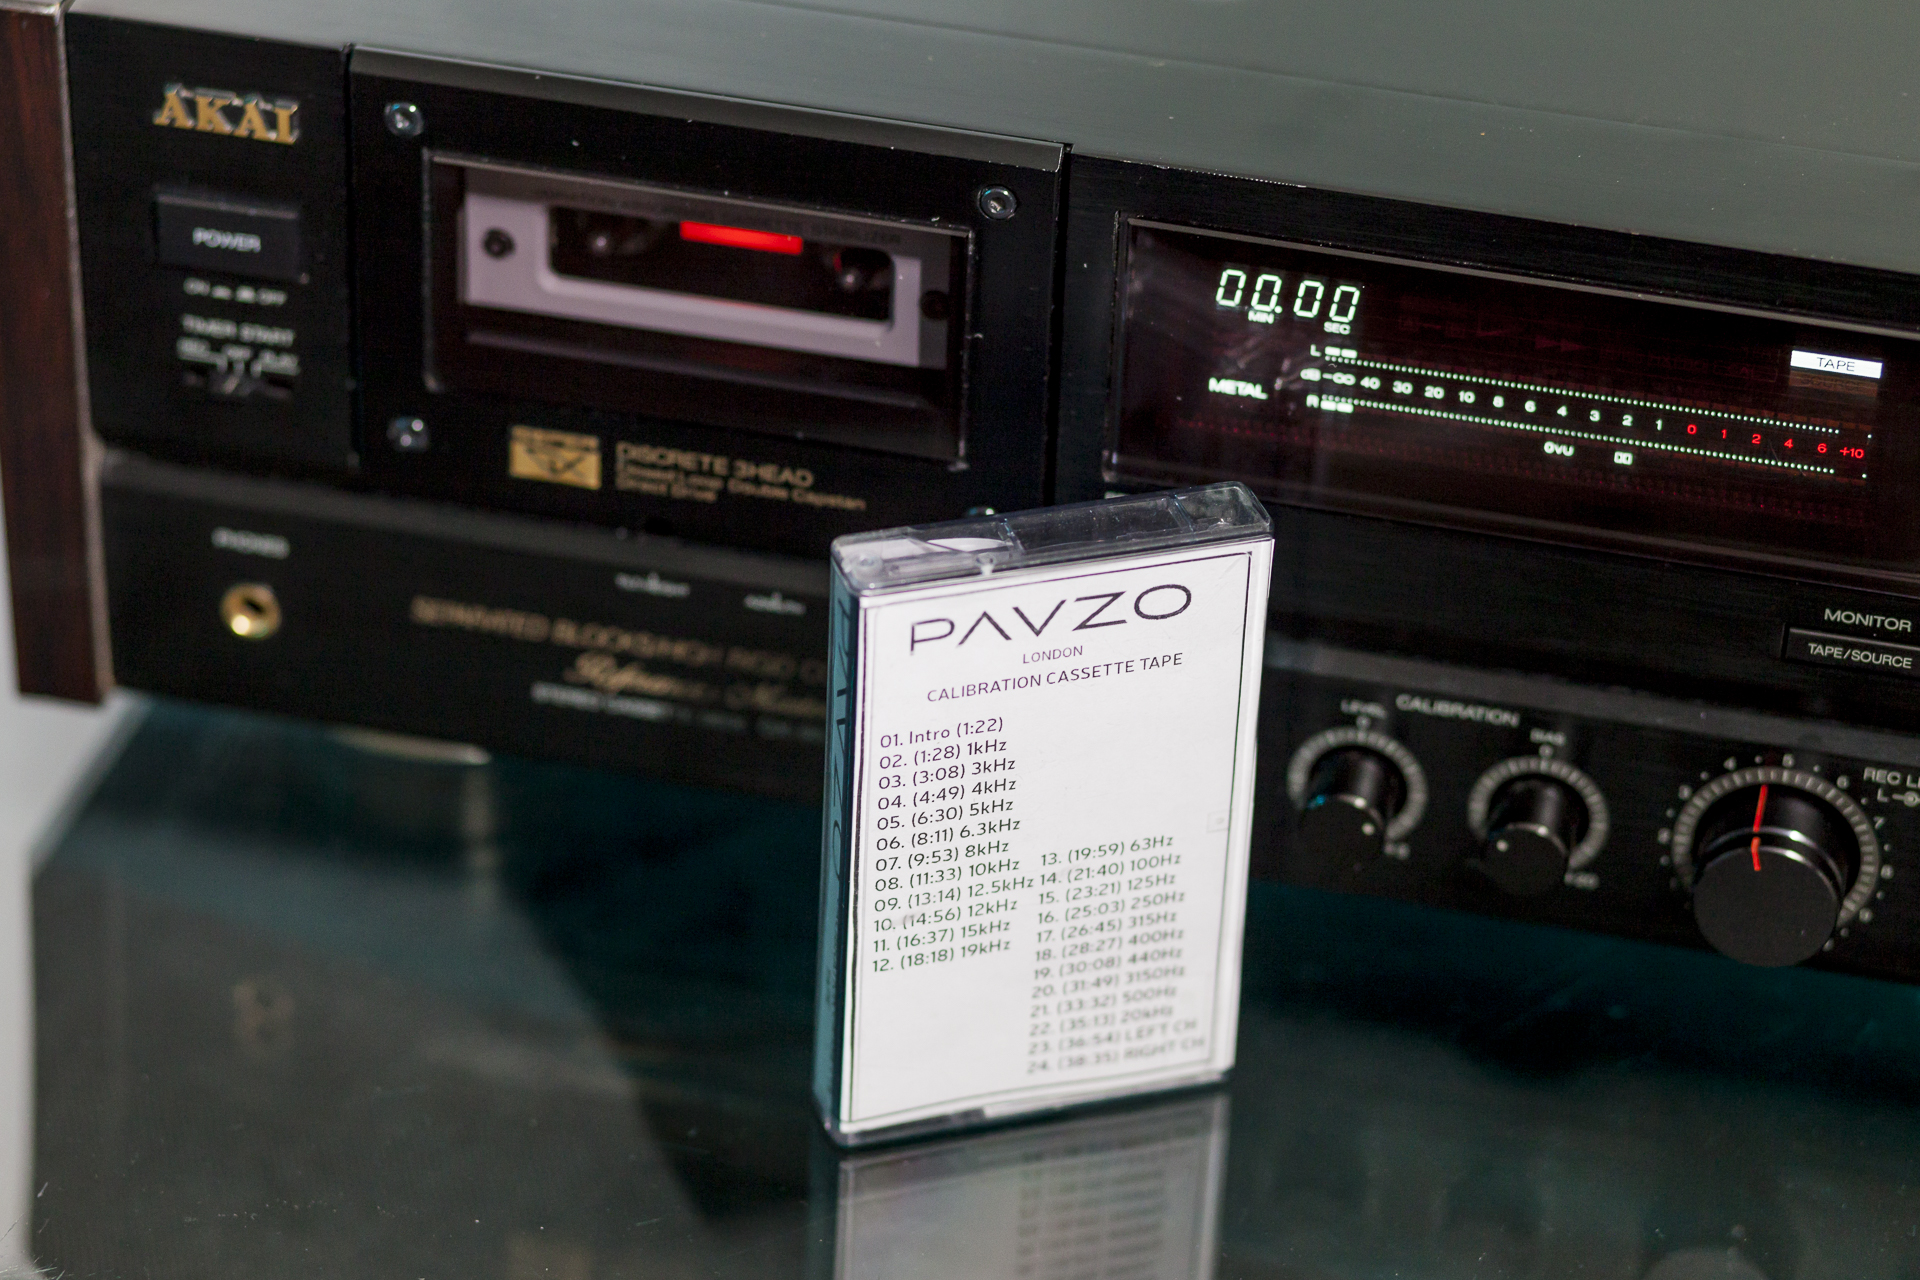 PAVZO – Calibration Cassette Tape for Test Speed BIAS Wow